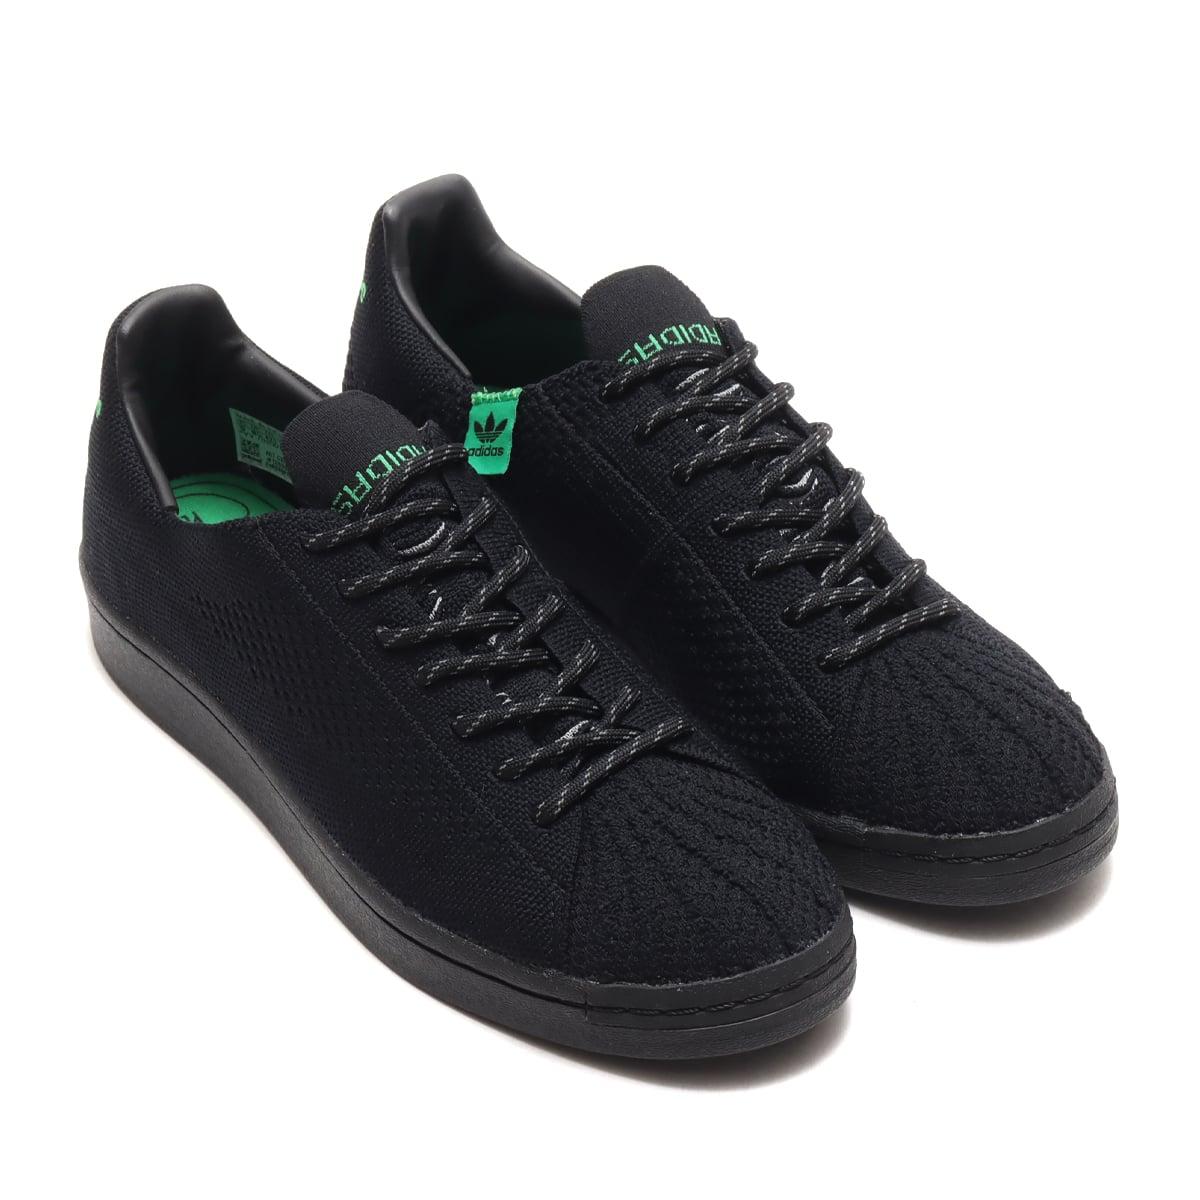 adidas PW SST PK CORE BLACK/CORE BLACK/VIVID GREEN 21SS-S_photo_large